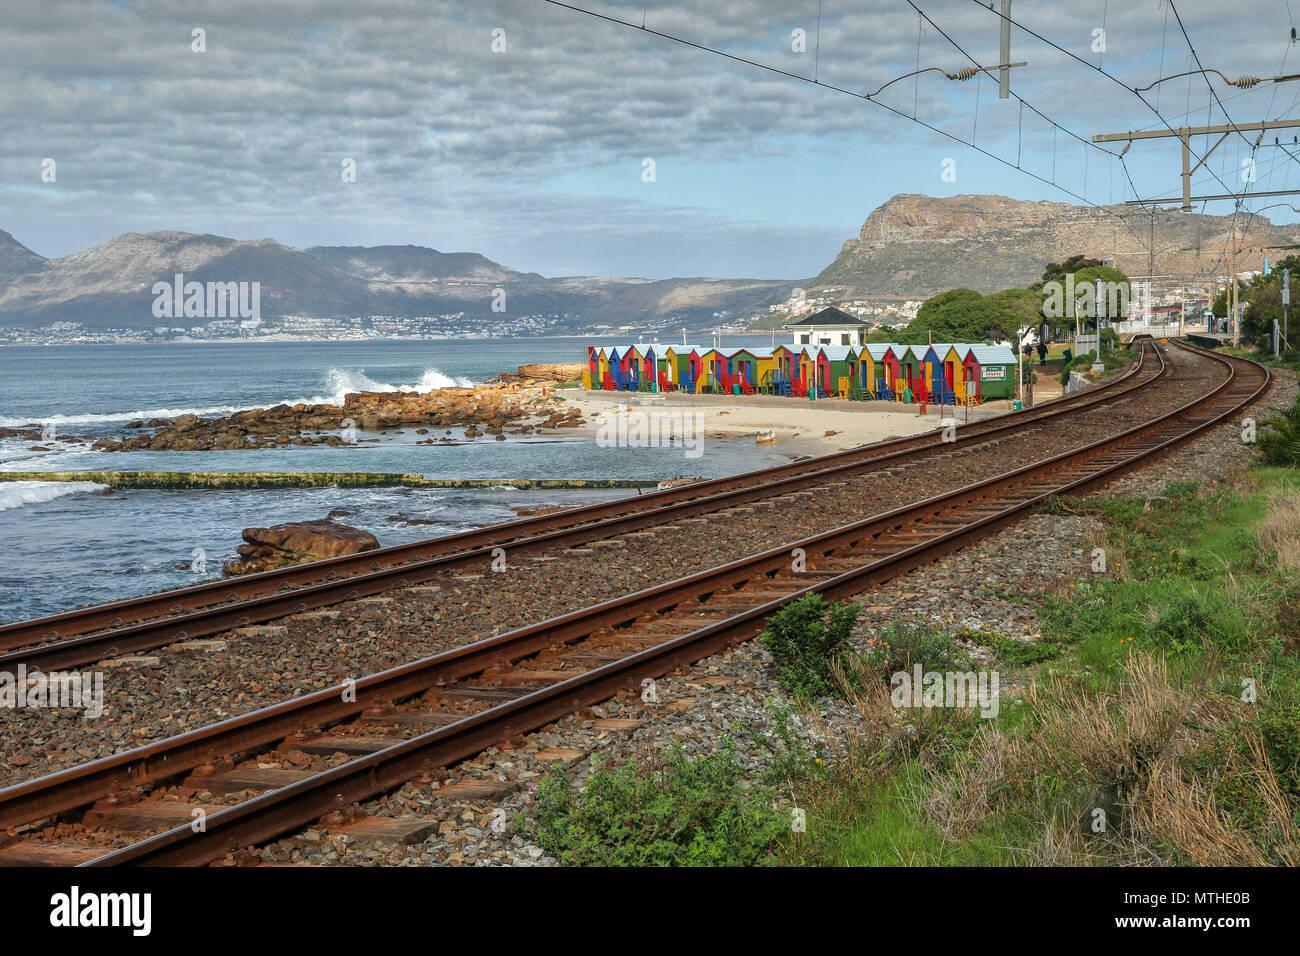 Railway tracks and beach huts on Glencairn beach, simondstown, garden route, south africa - Stock Image